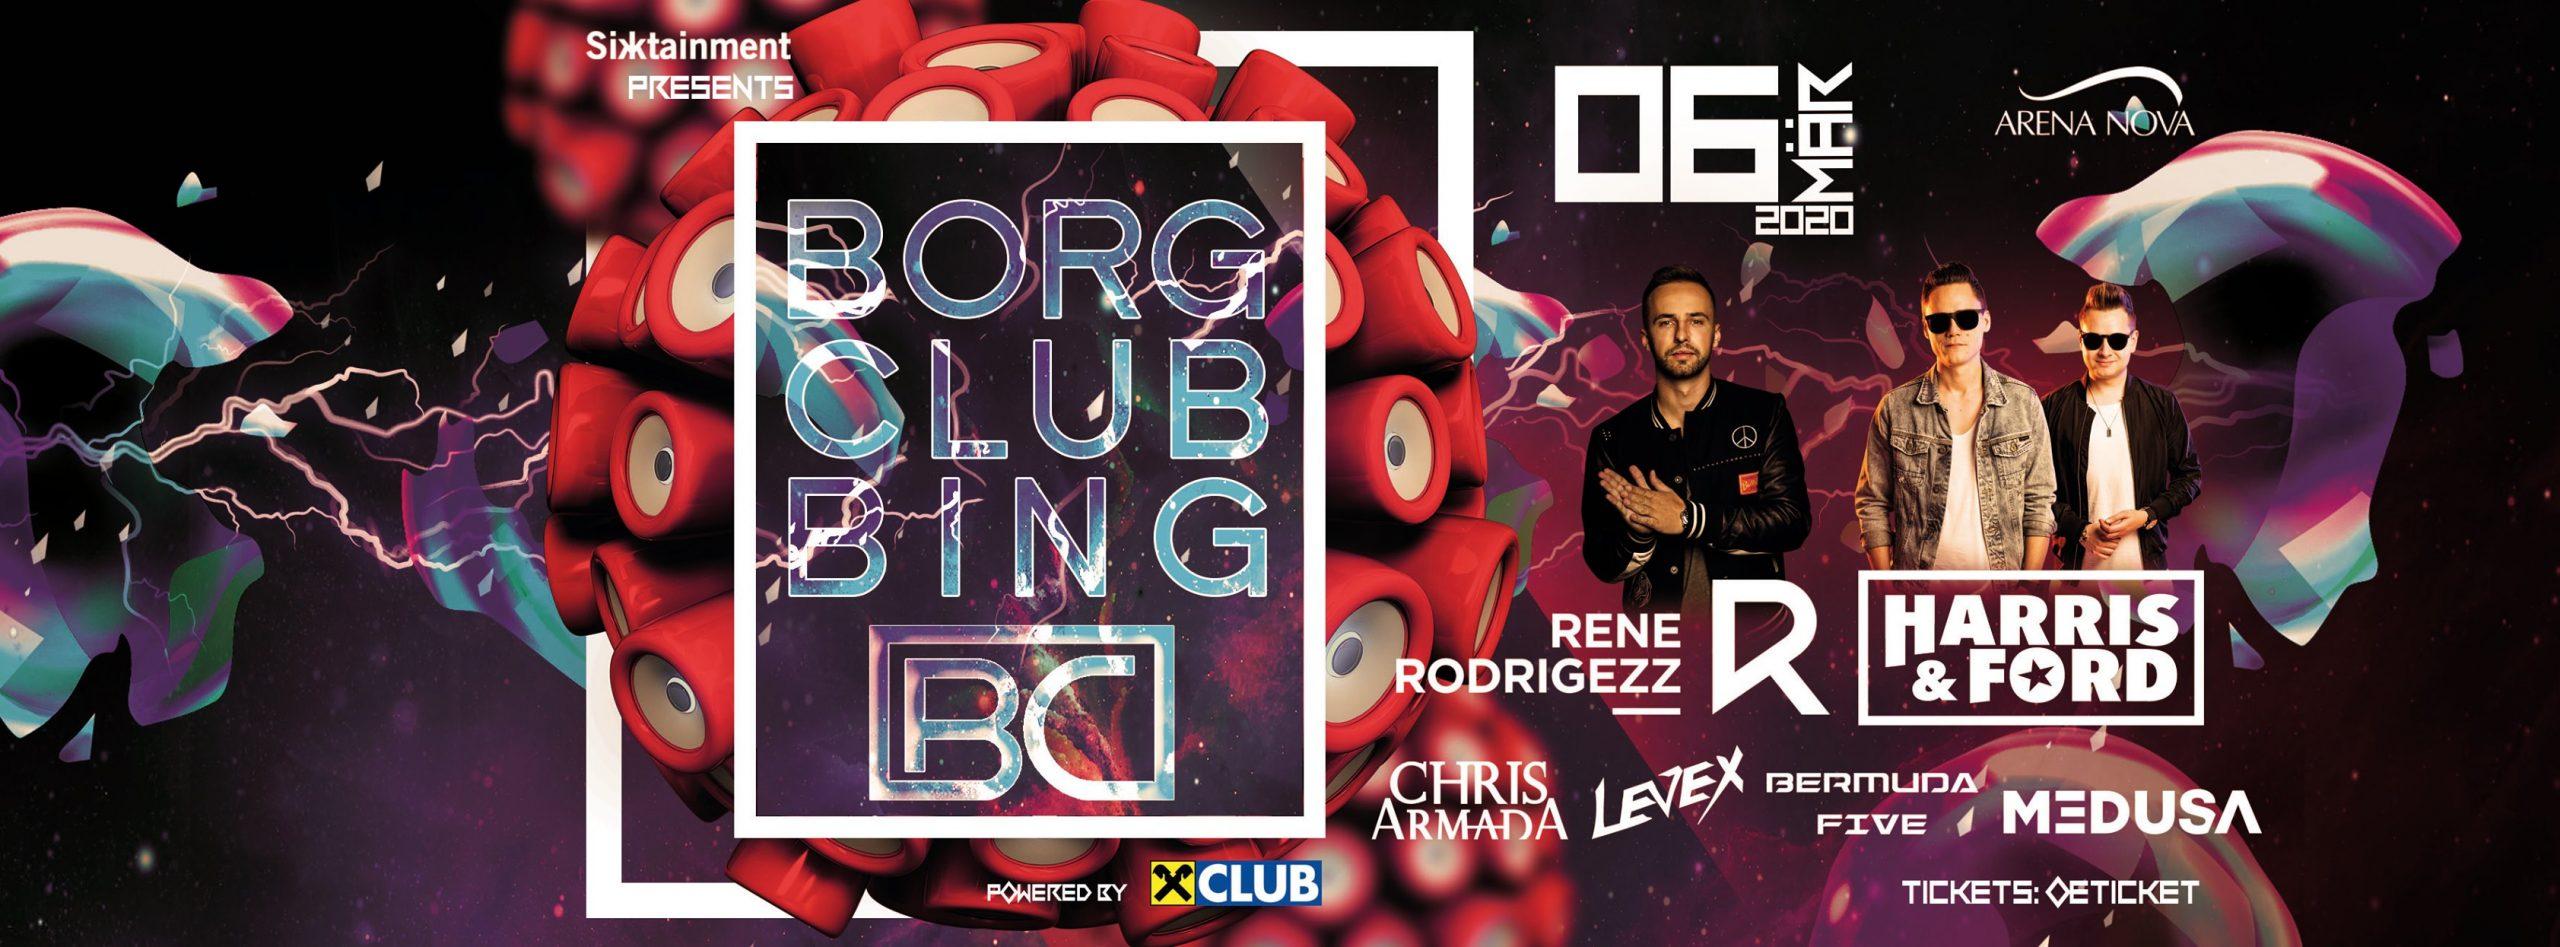 BORG Clubbing 2020 am 6. March 2020 @ Arena Nova Playgrounds.